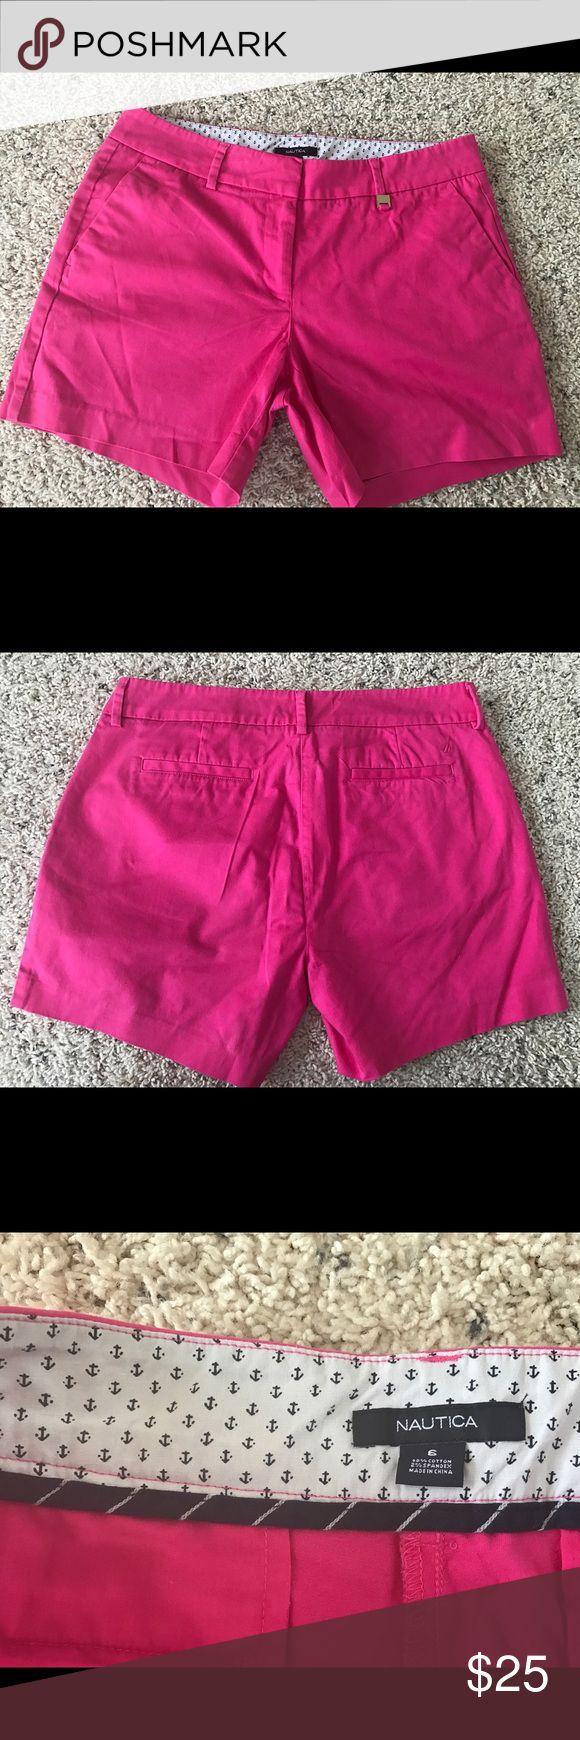 Nautica women's pink shorts size 6 Excellent condition Nautica pink shorts 6 inches inseam. Nautica Shorts